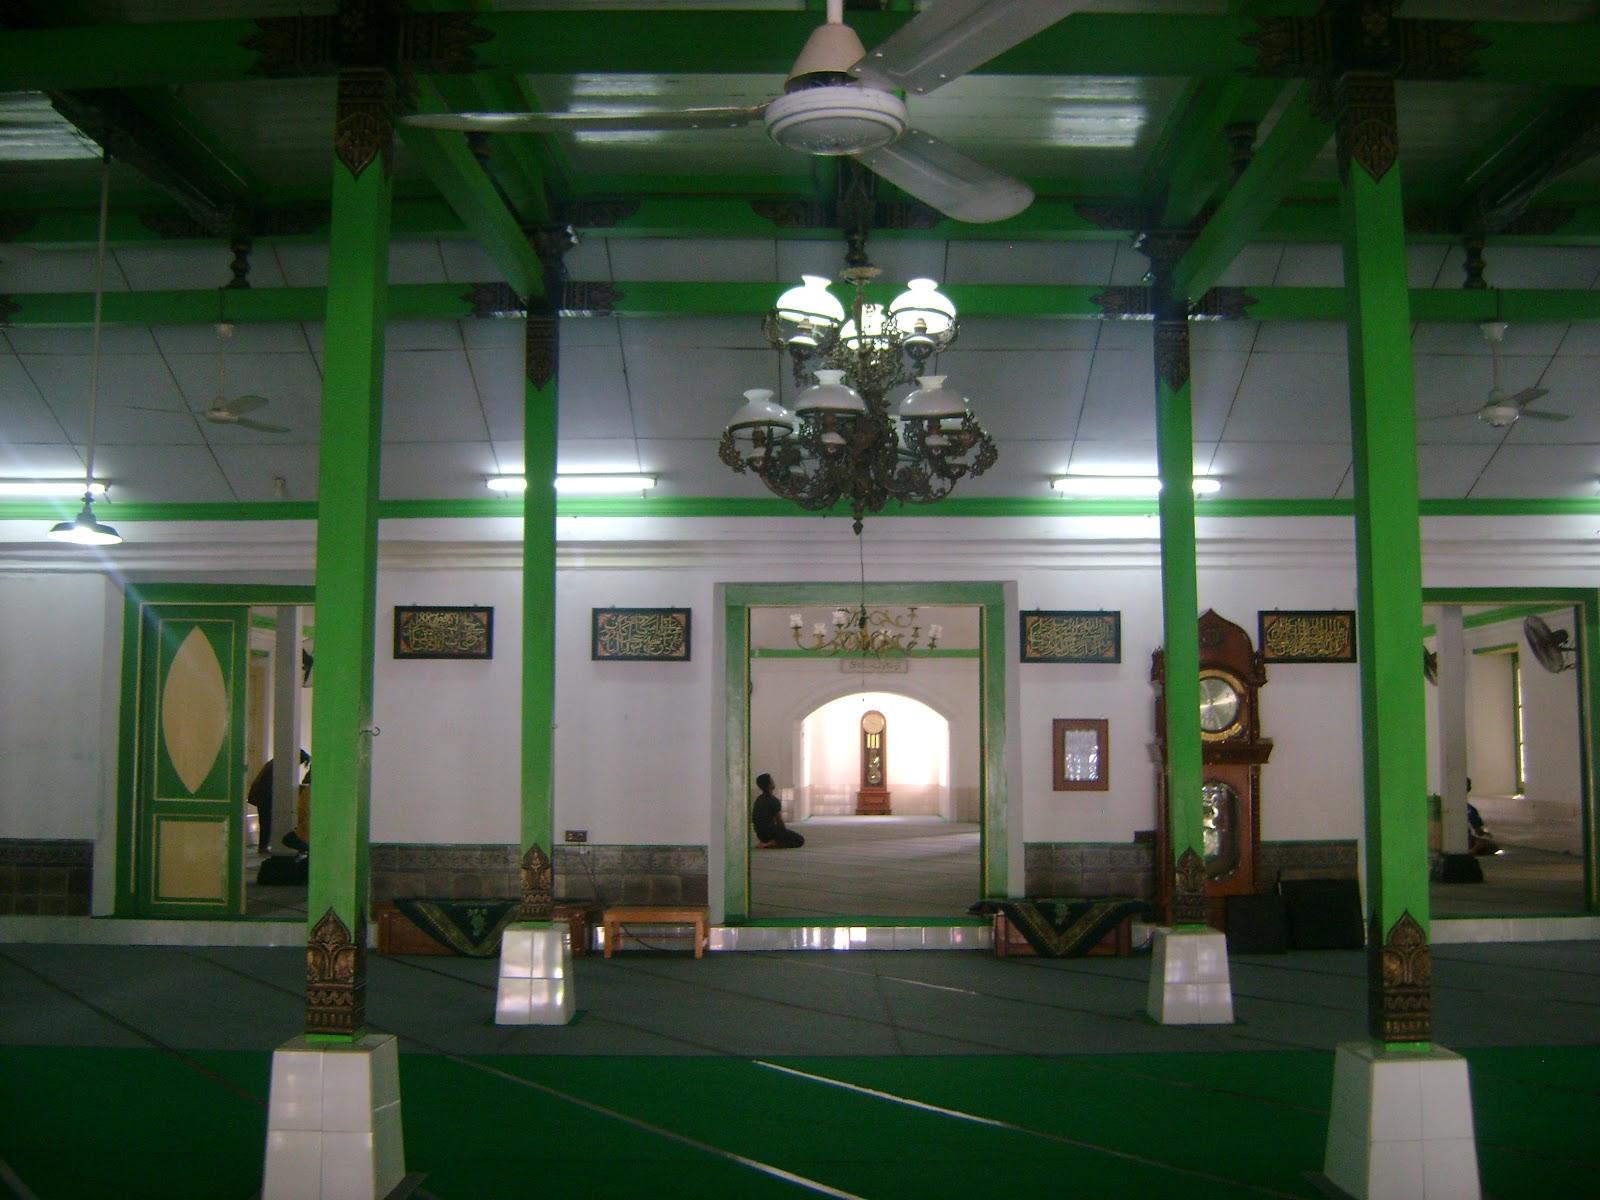 Sensasi Mistis Historis Unik Sebuah Masjid Kuno Pemandu Makam Taman